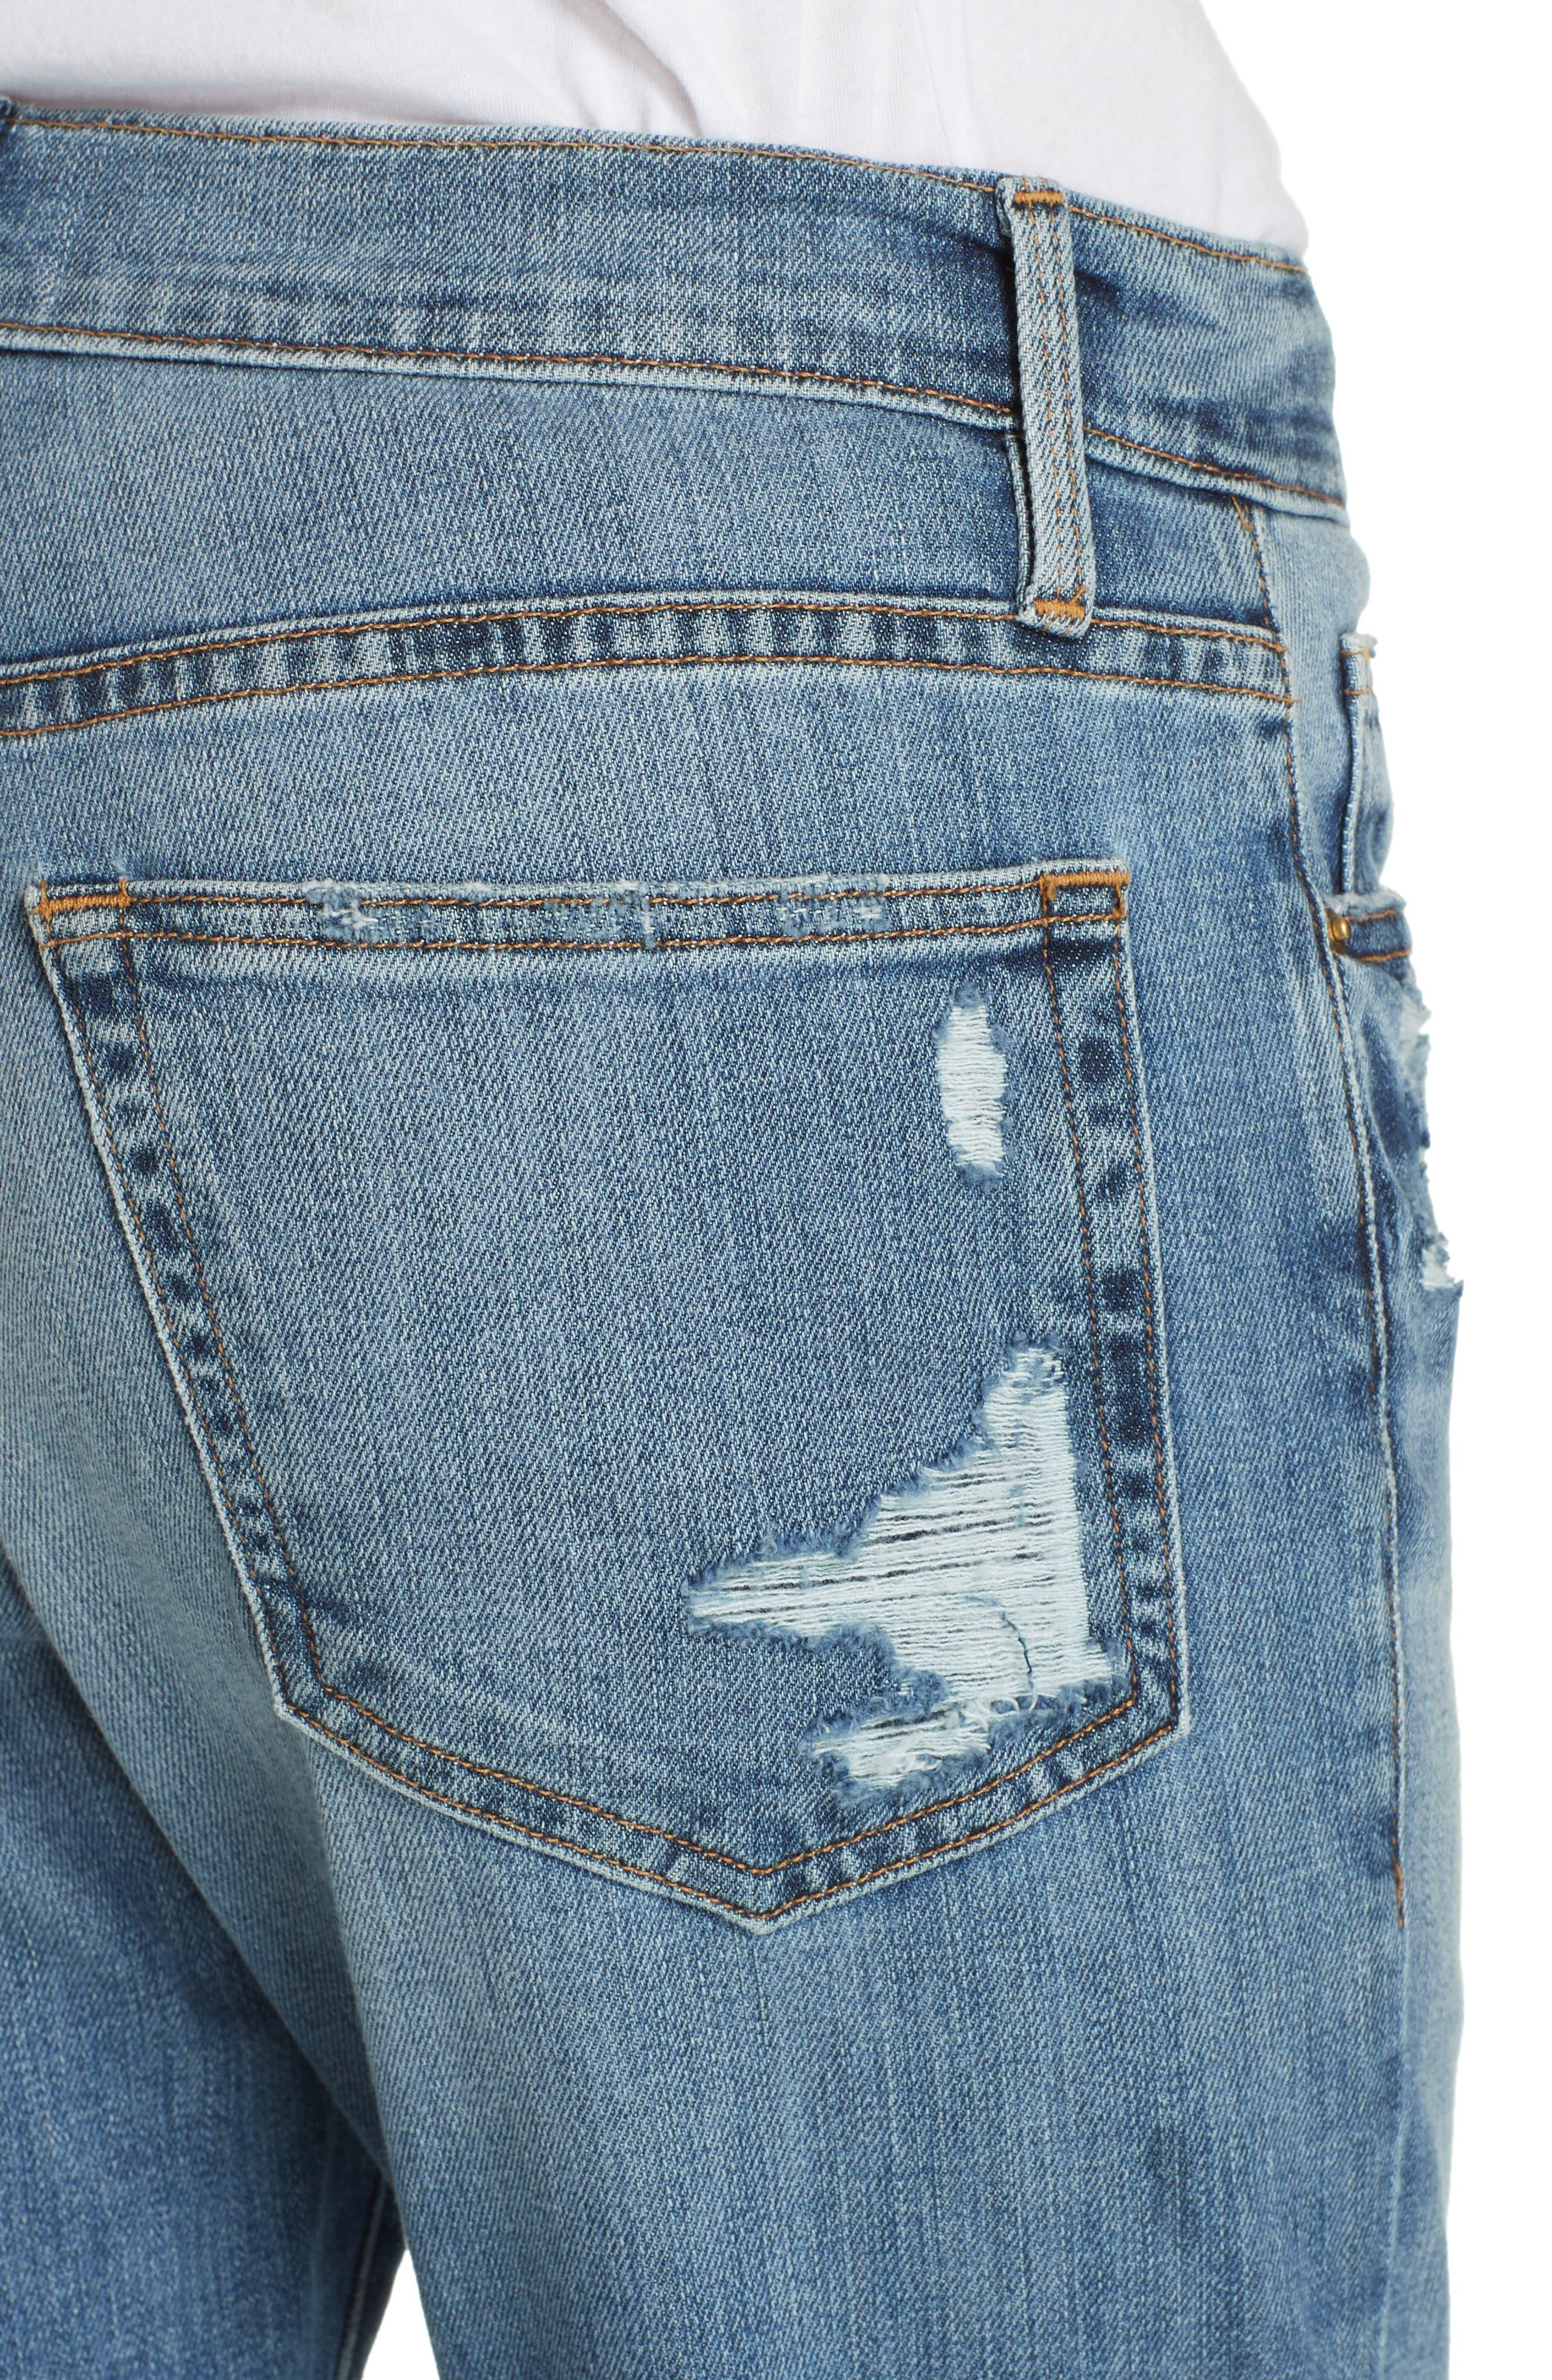 FRAME, Le Boy Distressed Boyfriend Jeans, Alternate thumbnail 5, color, BECKHAM